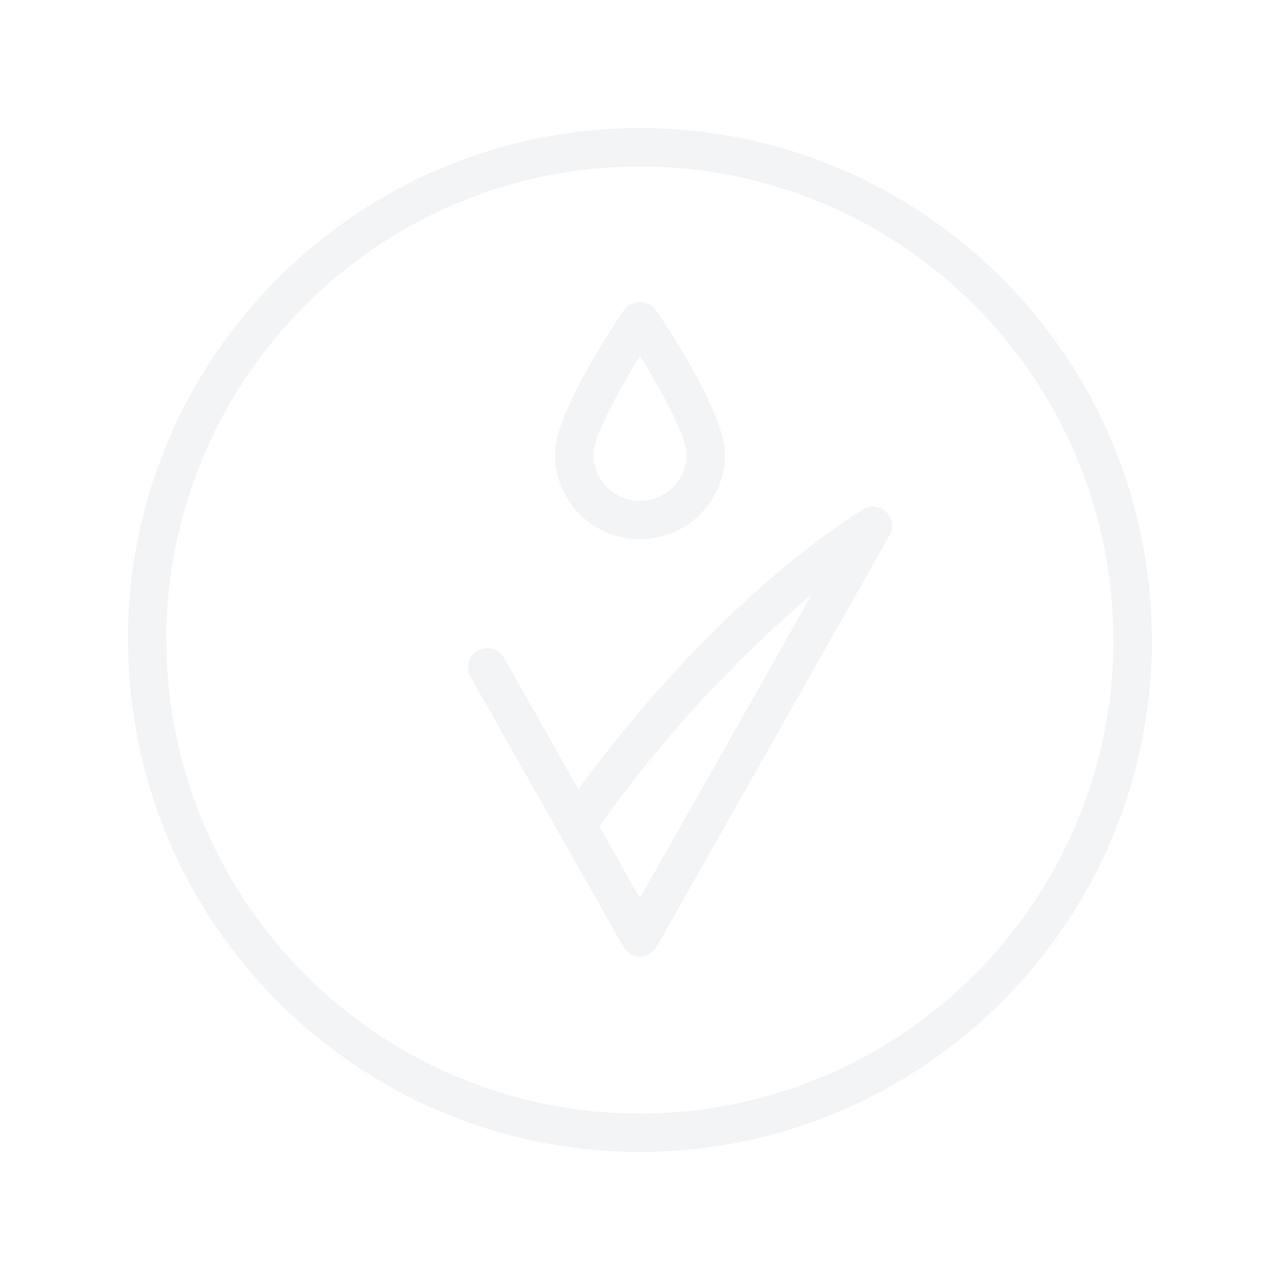 HOLIKA HOLIKA Good Cera Super Ceramide Lip Oil Stick 3.3g